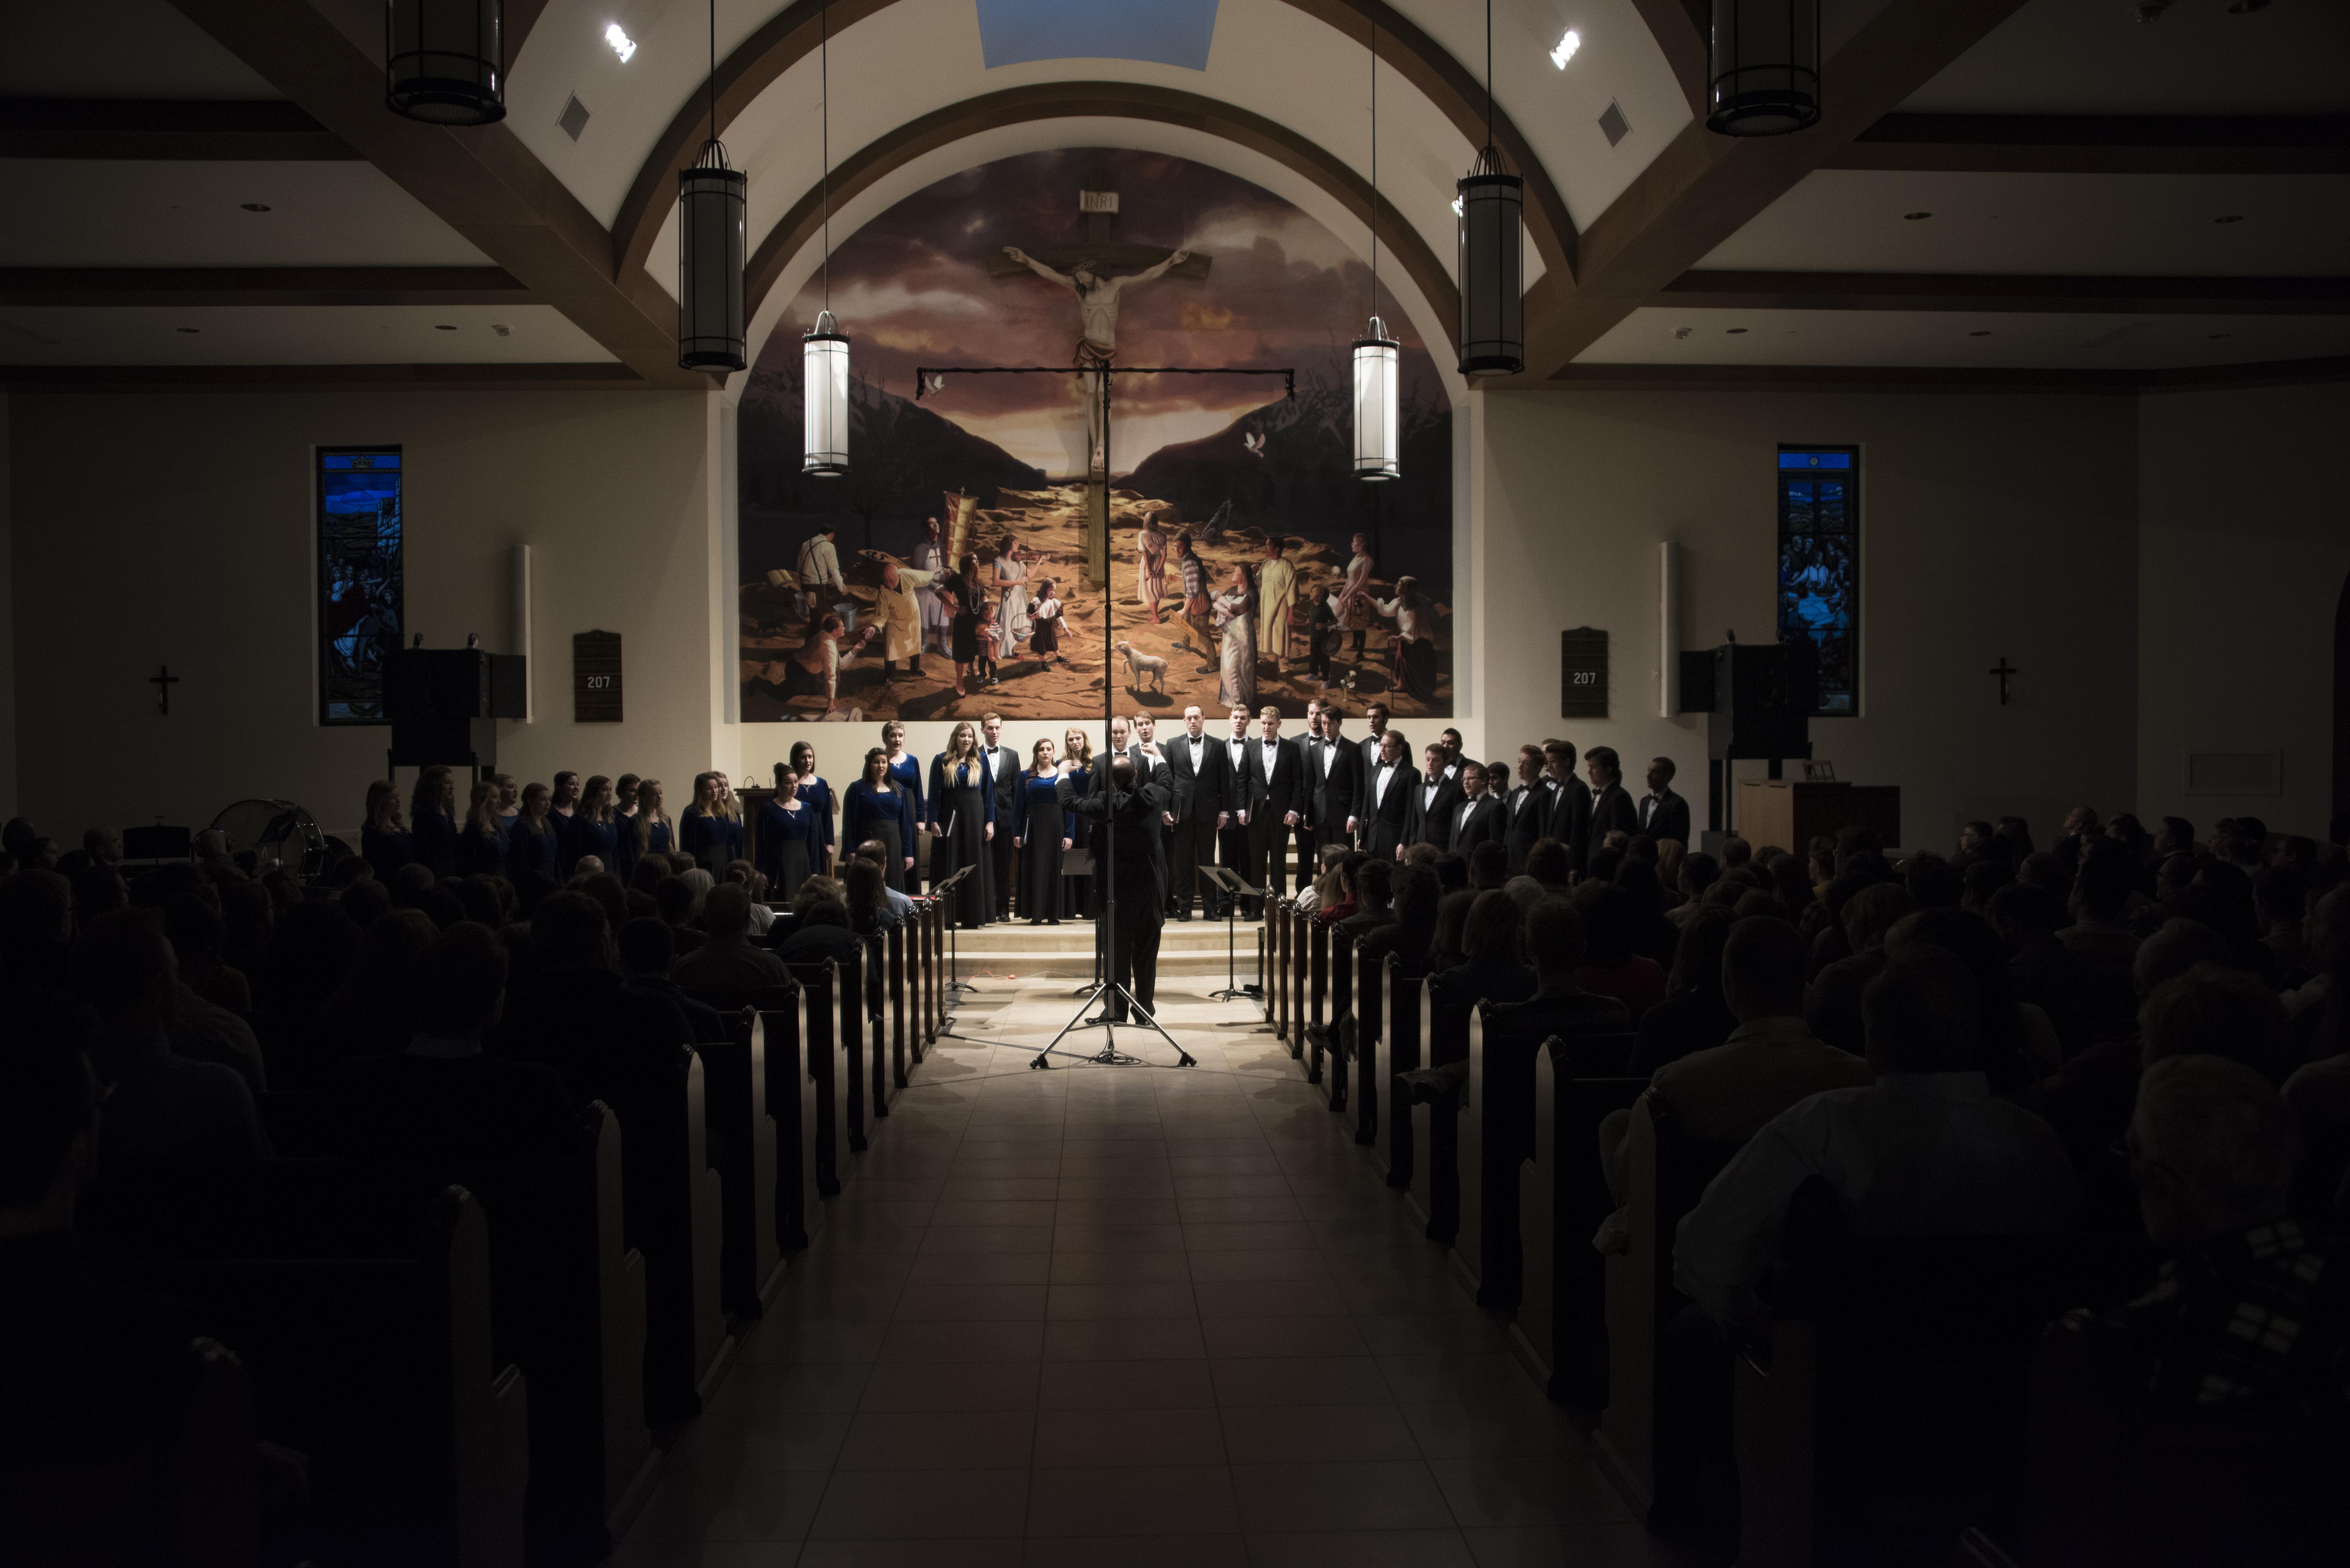 BYU Singers at St. Francis of Assissi Cathedral in Orem, Utah 2017. Photo by Sandefur Schmidt.